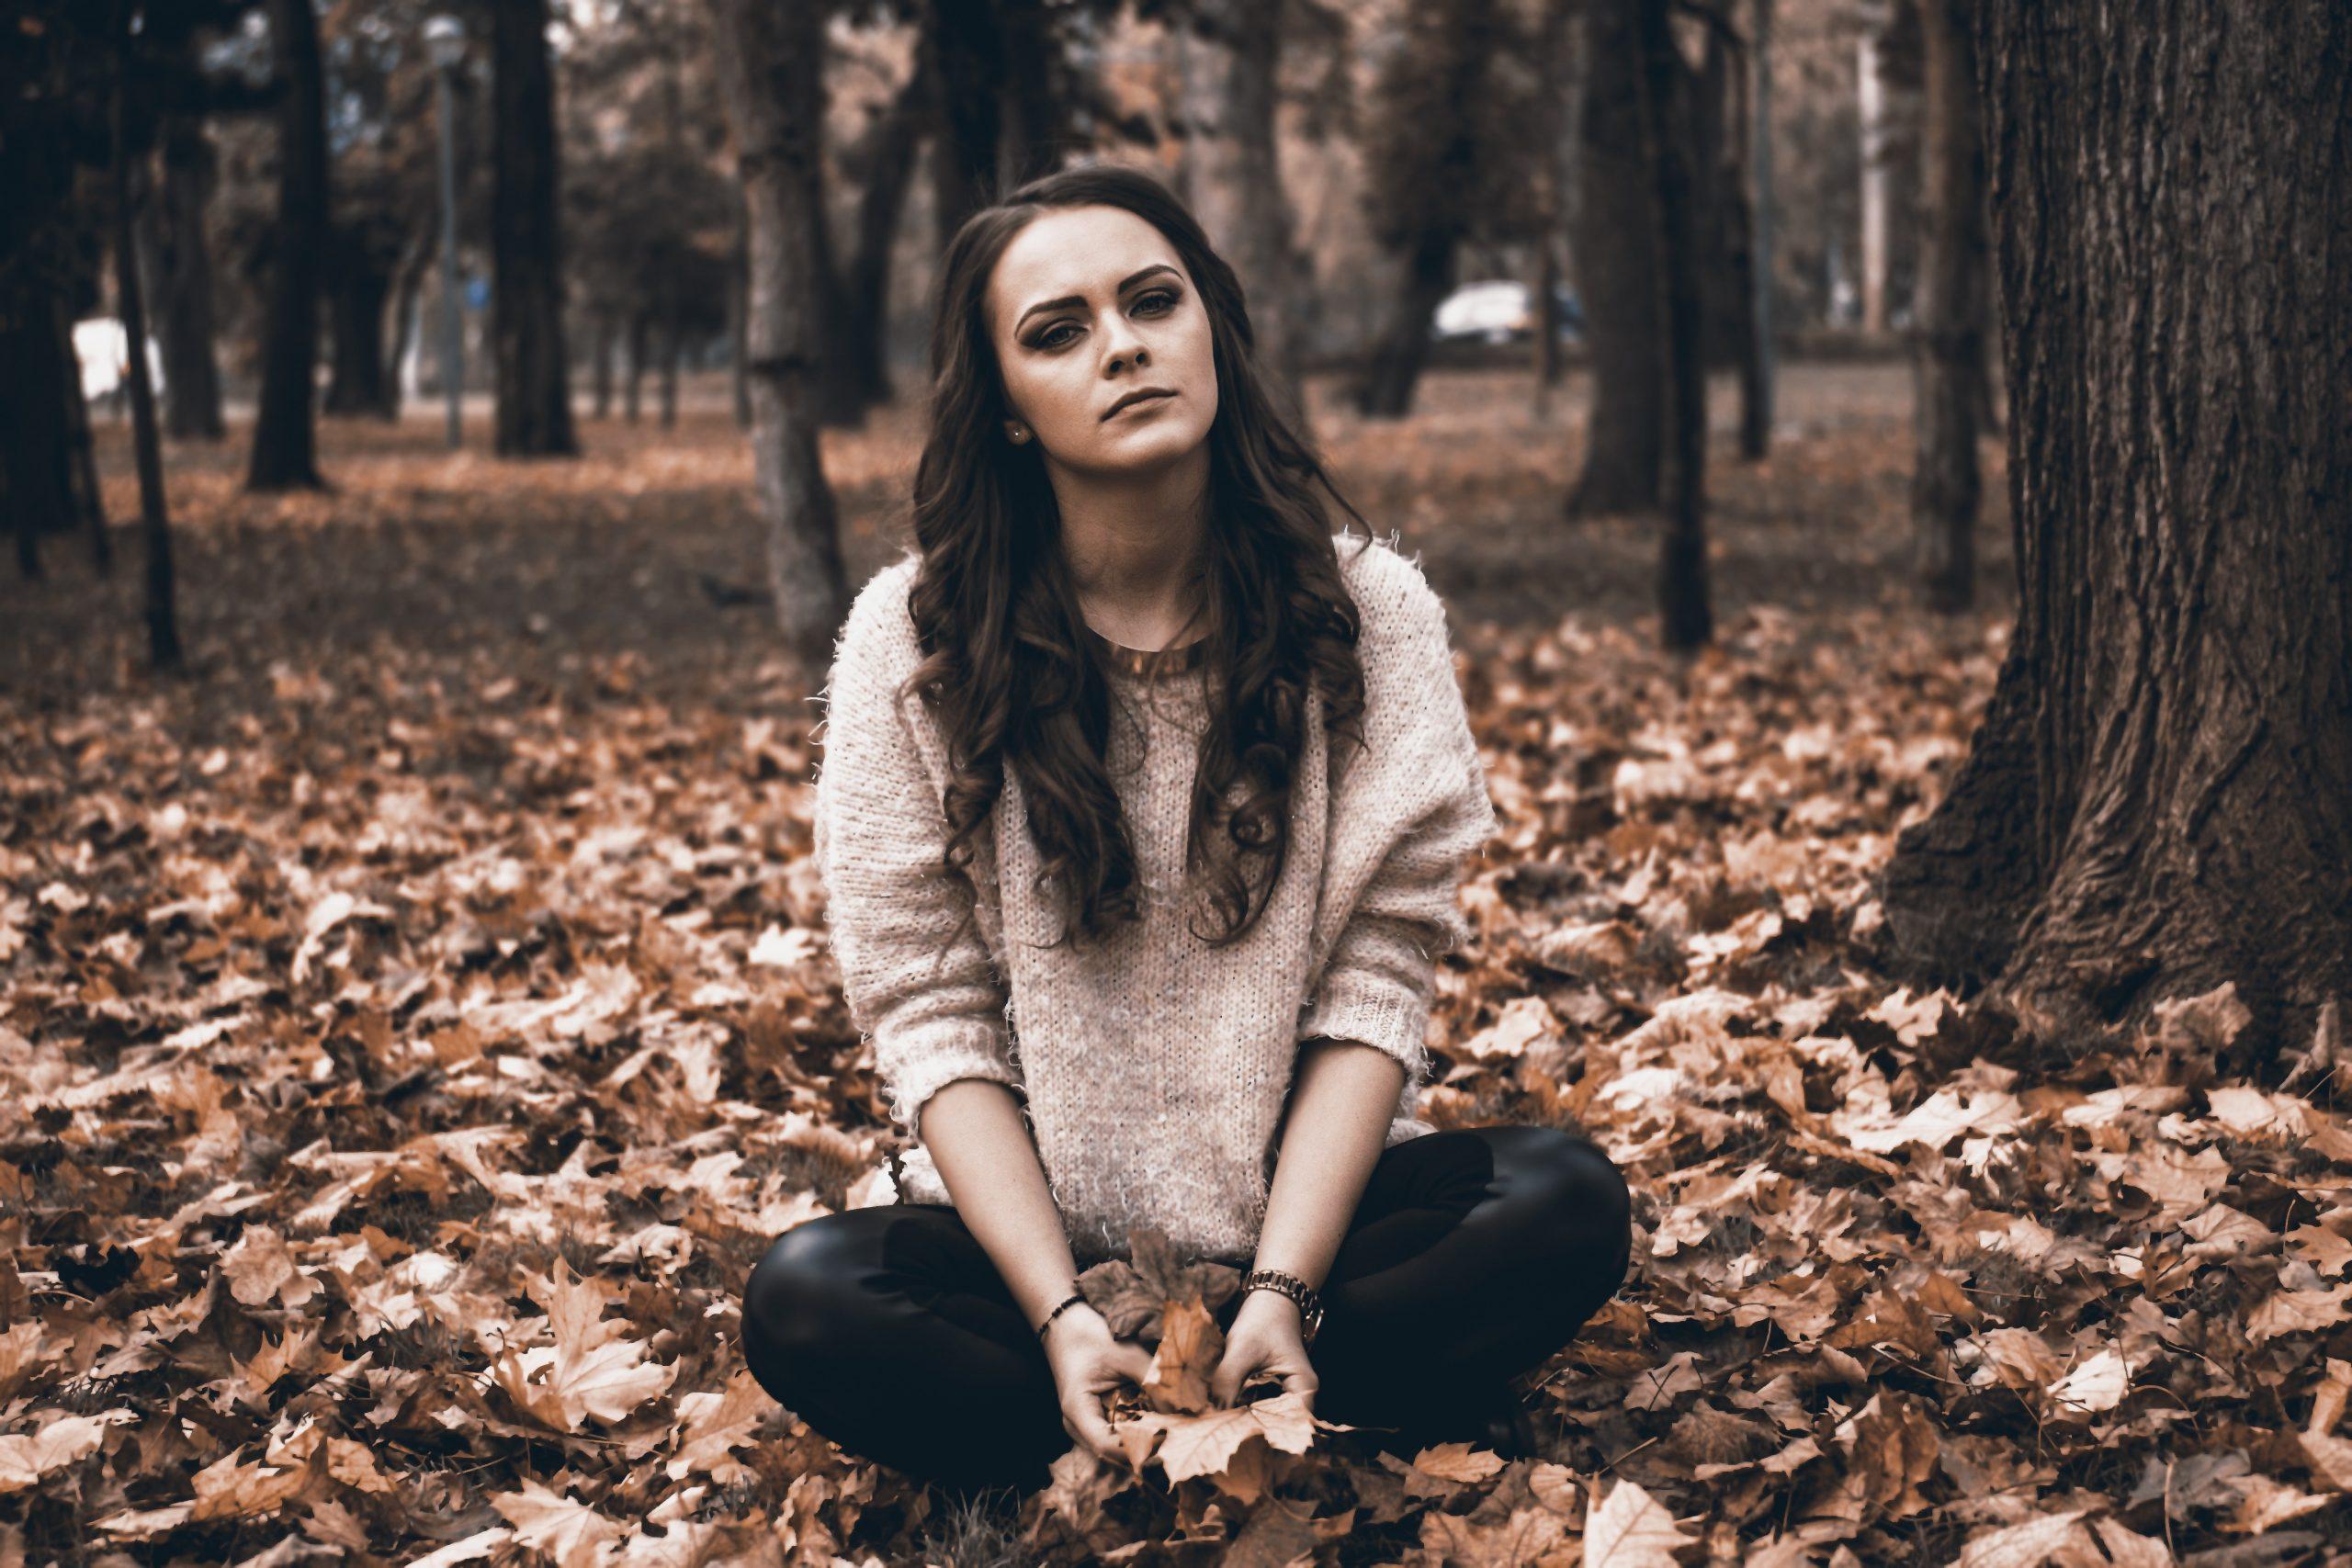 adolescente sentada